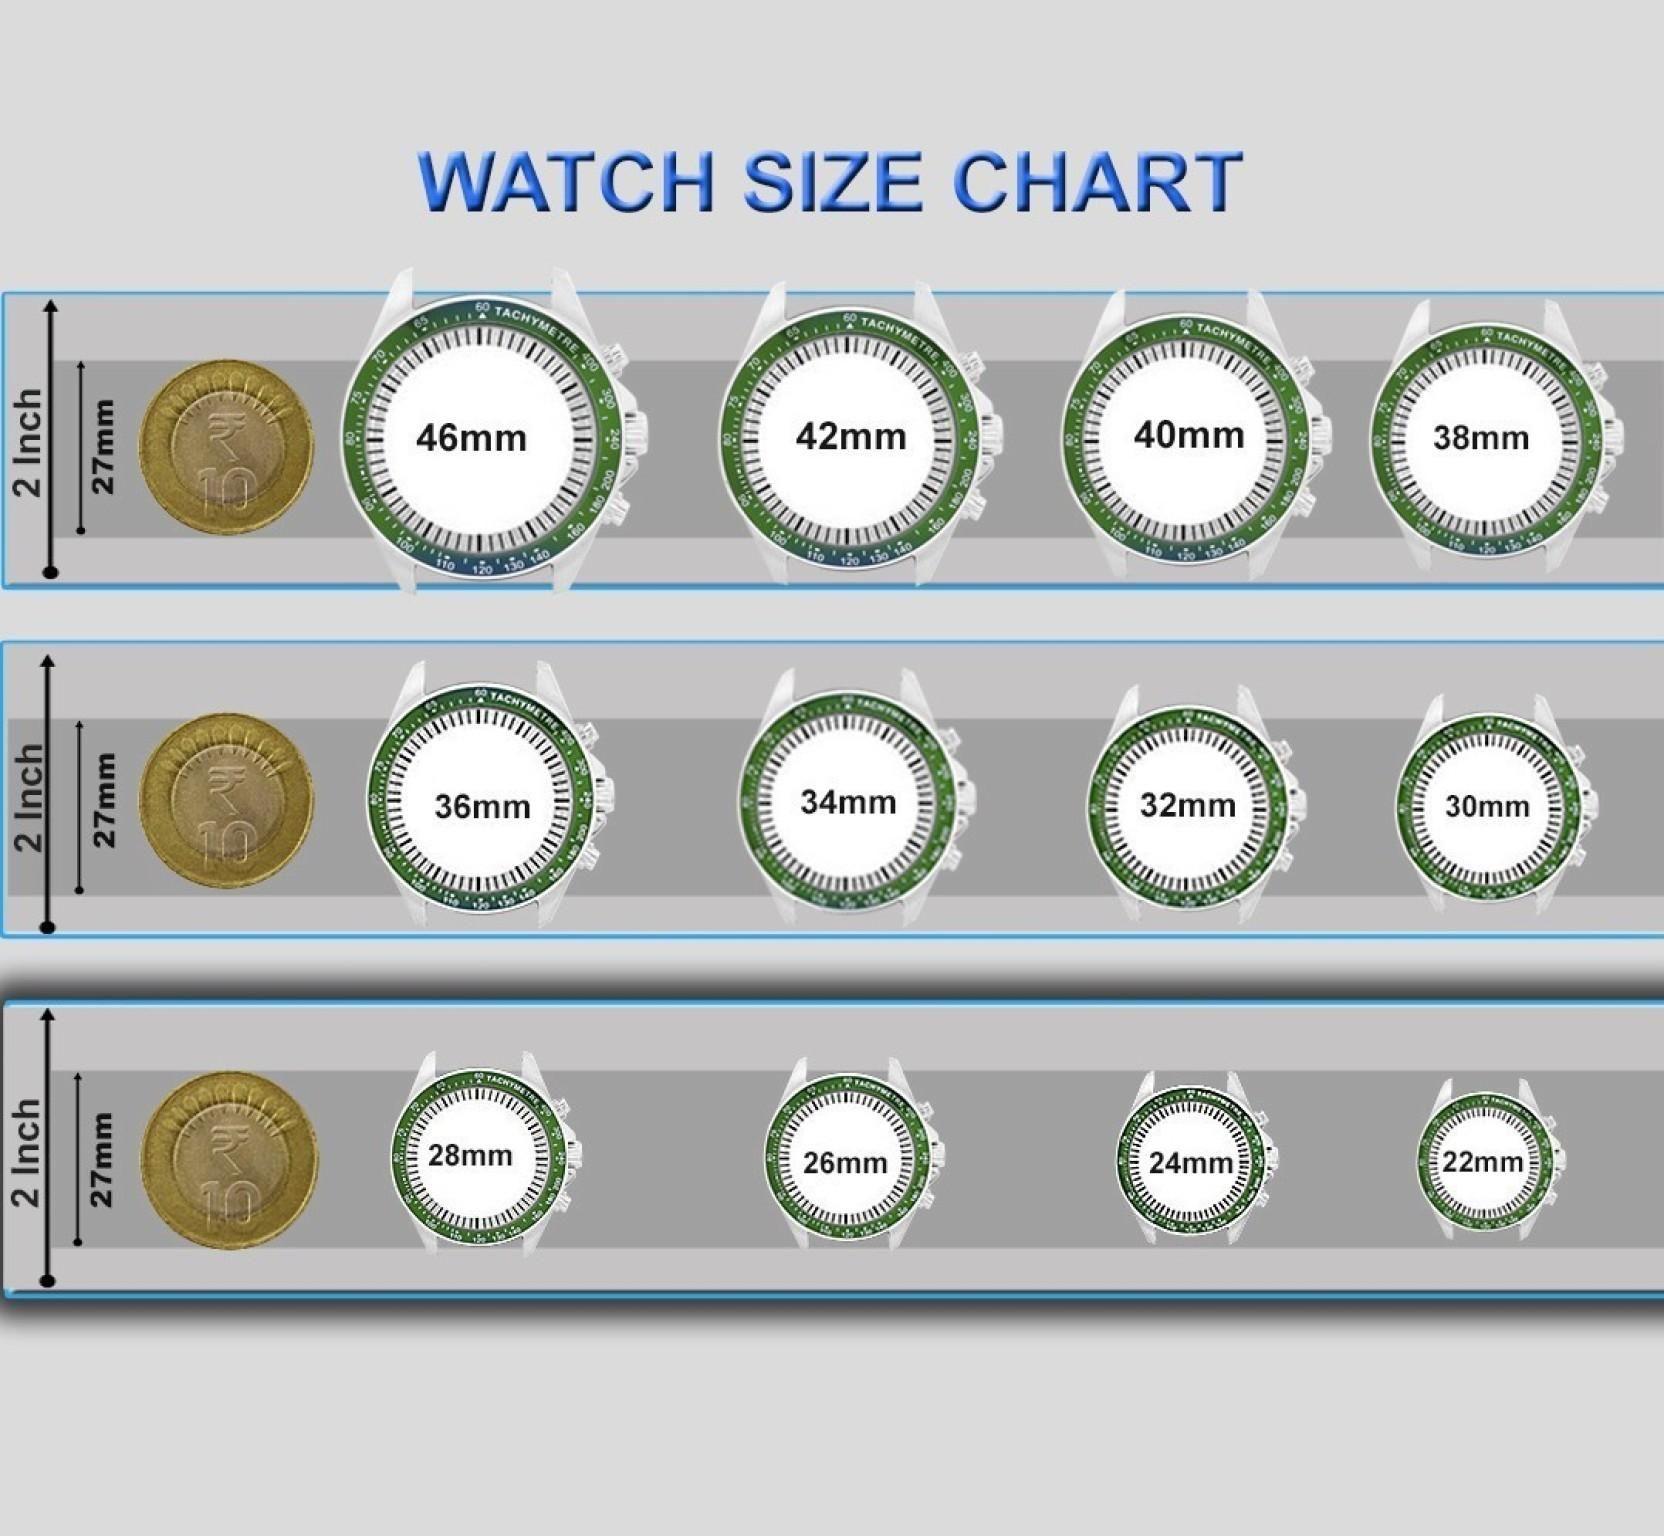 Timebre GXBRW314 Ultra Slim Watch - For Men